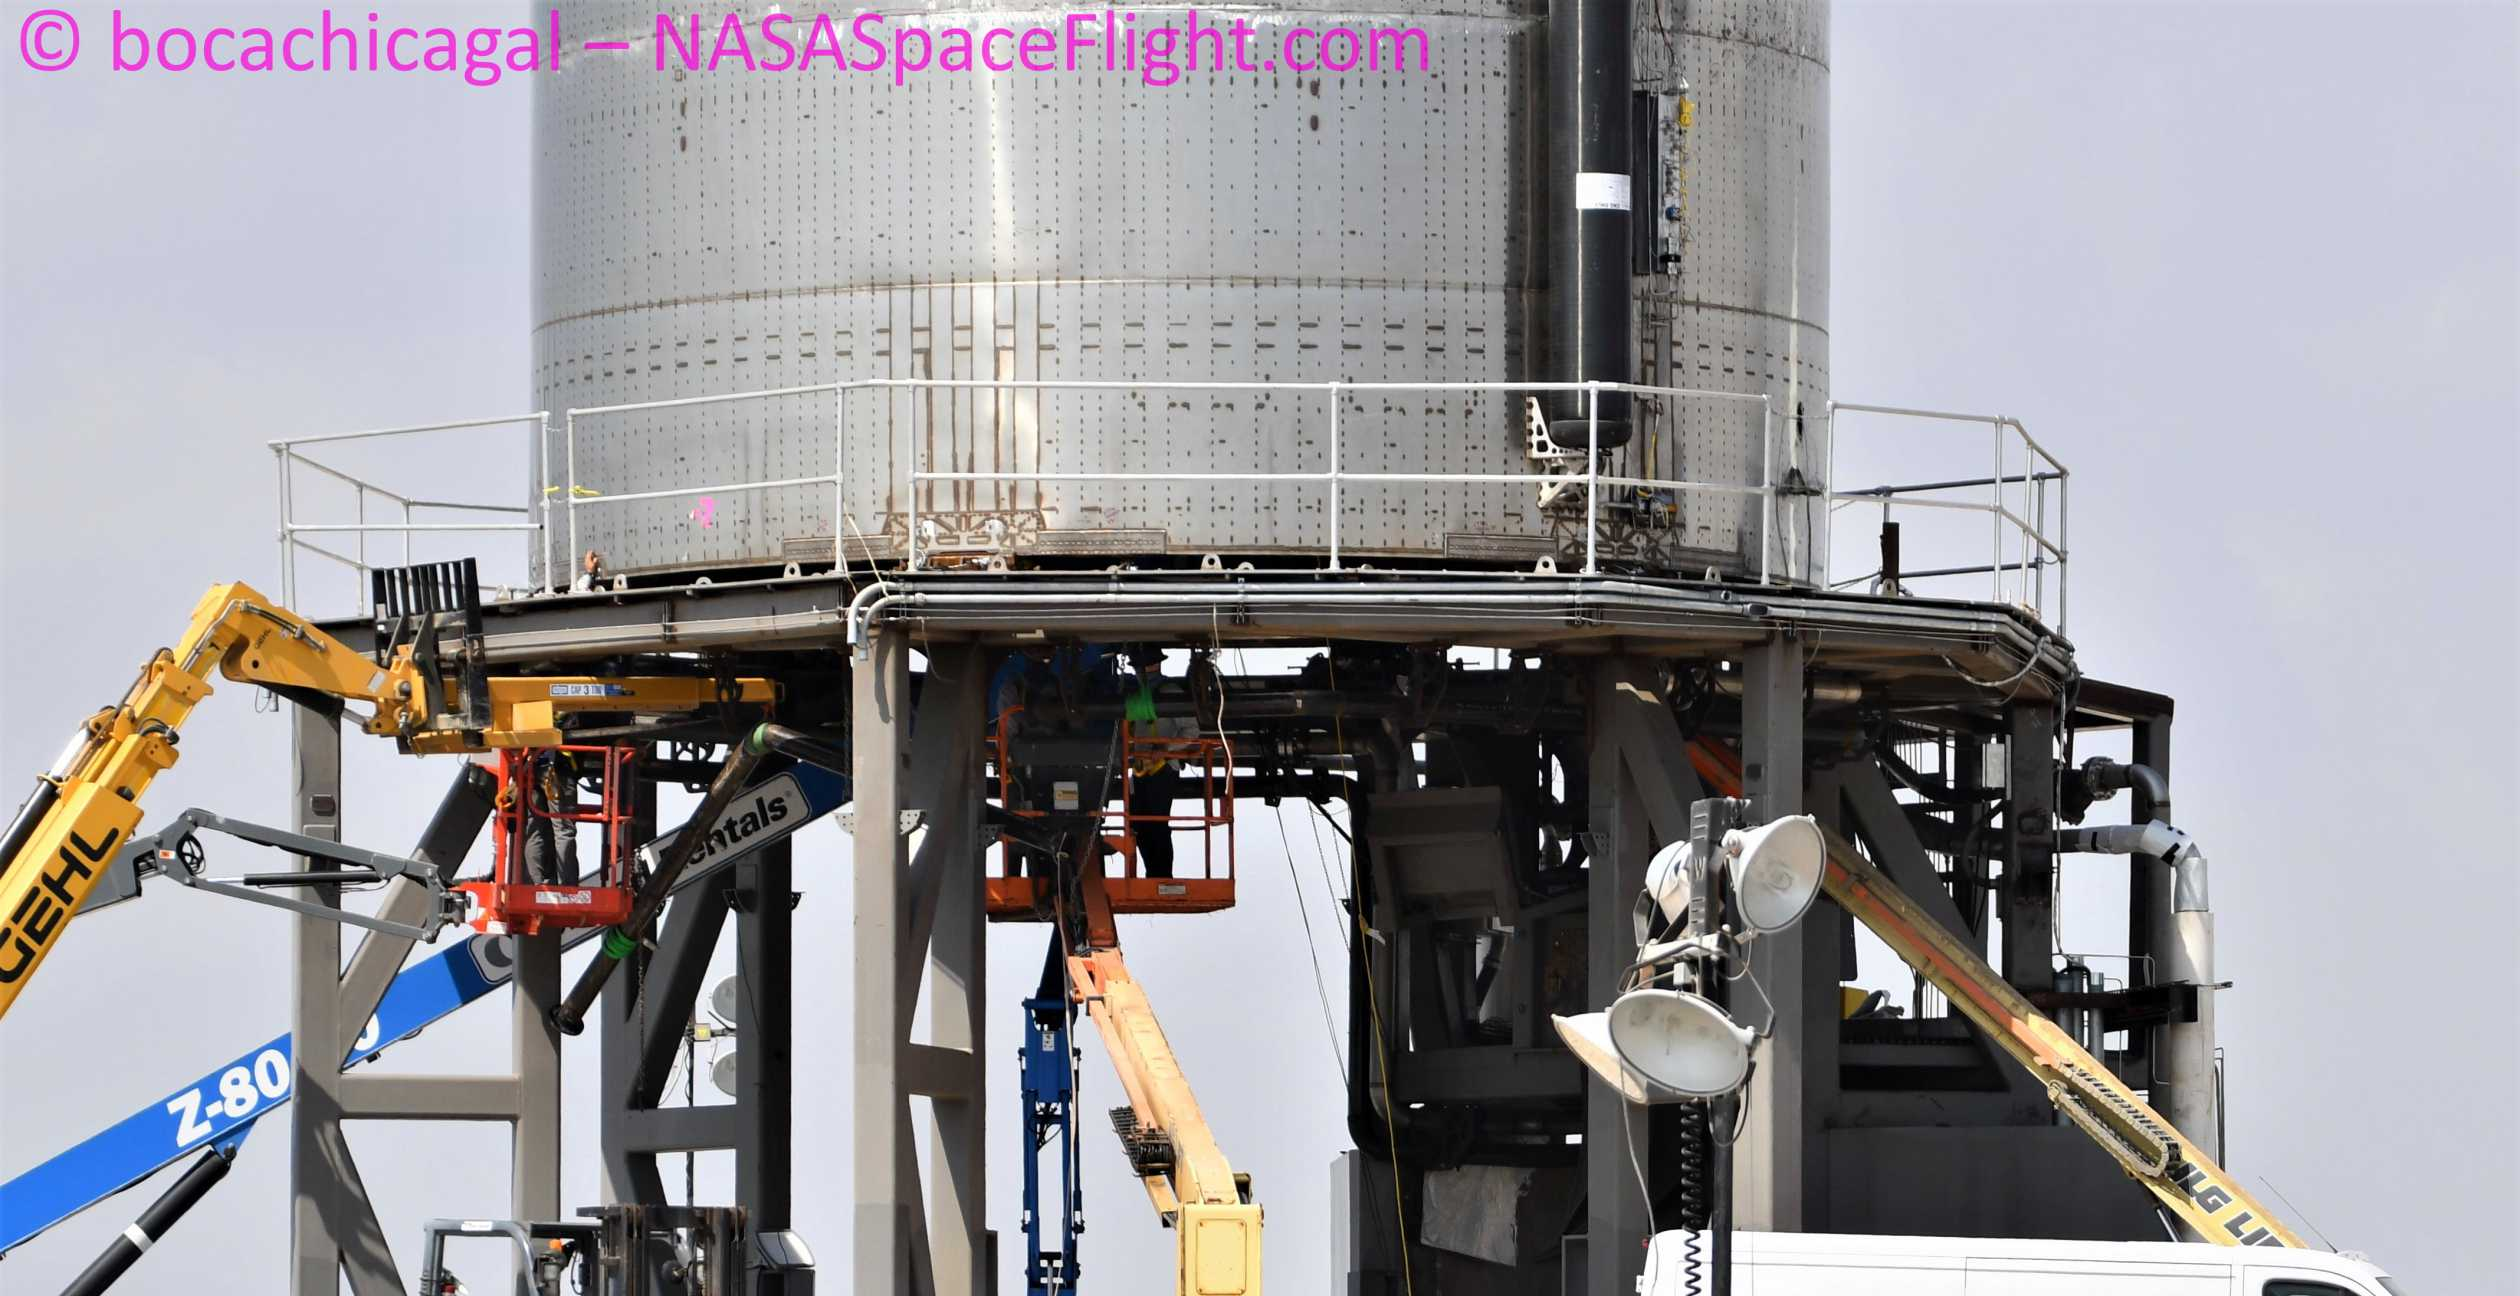 Starship Boca Chica 070620 (NASASpaceflight – bocachicagal) SN5 pad work 4 crop (c)